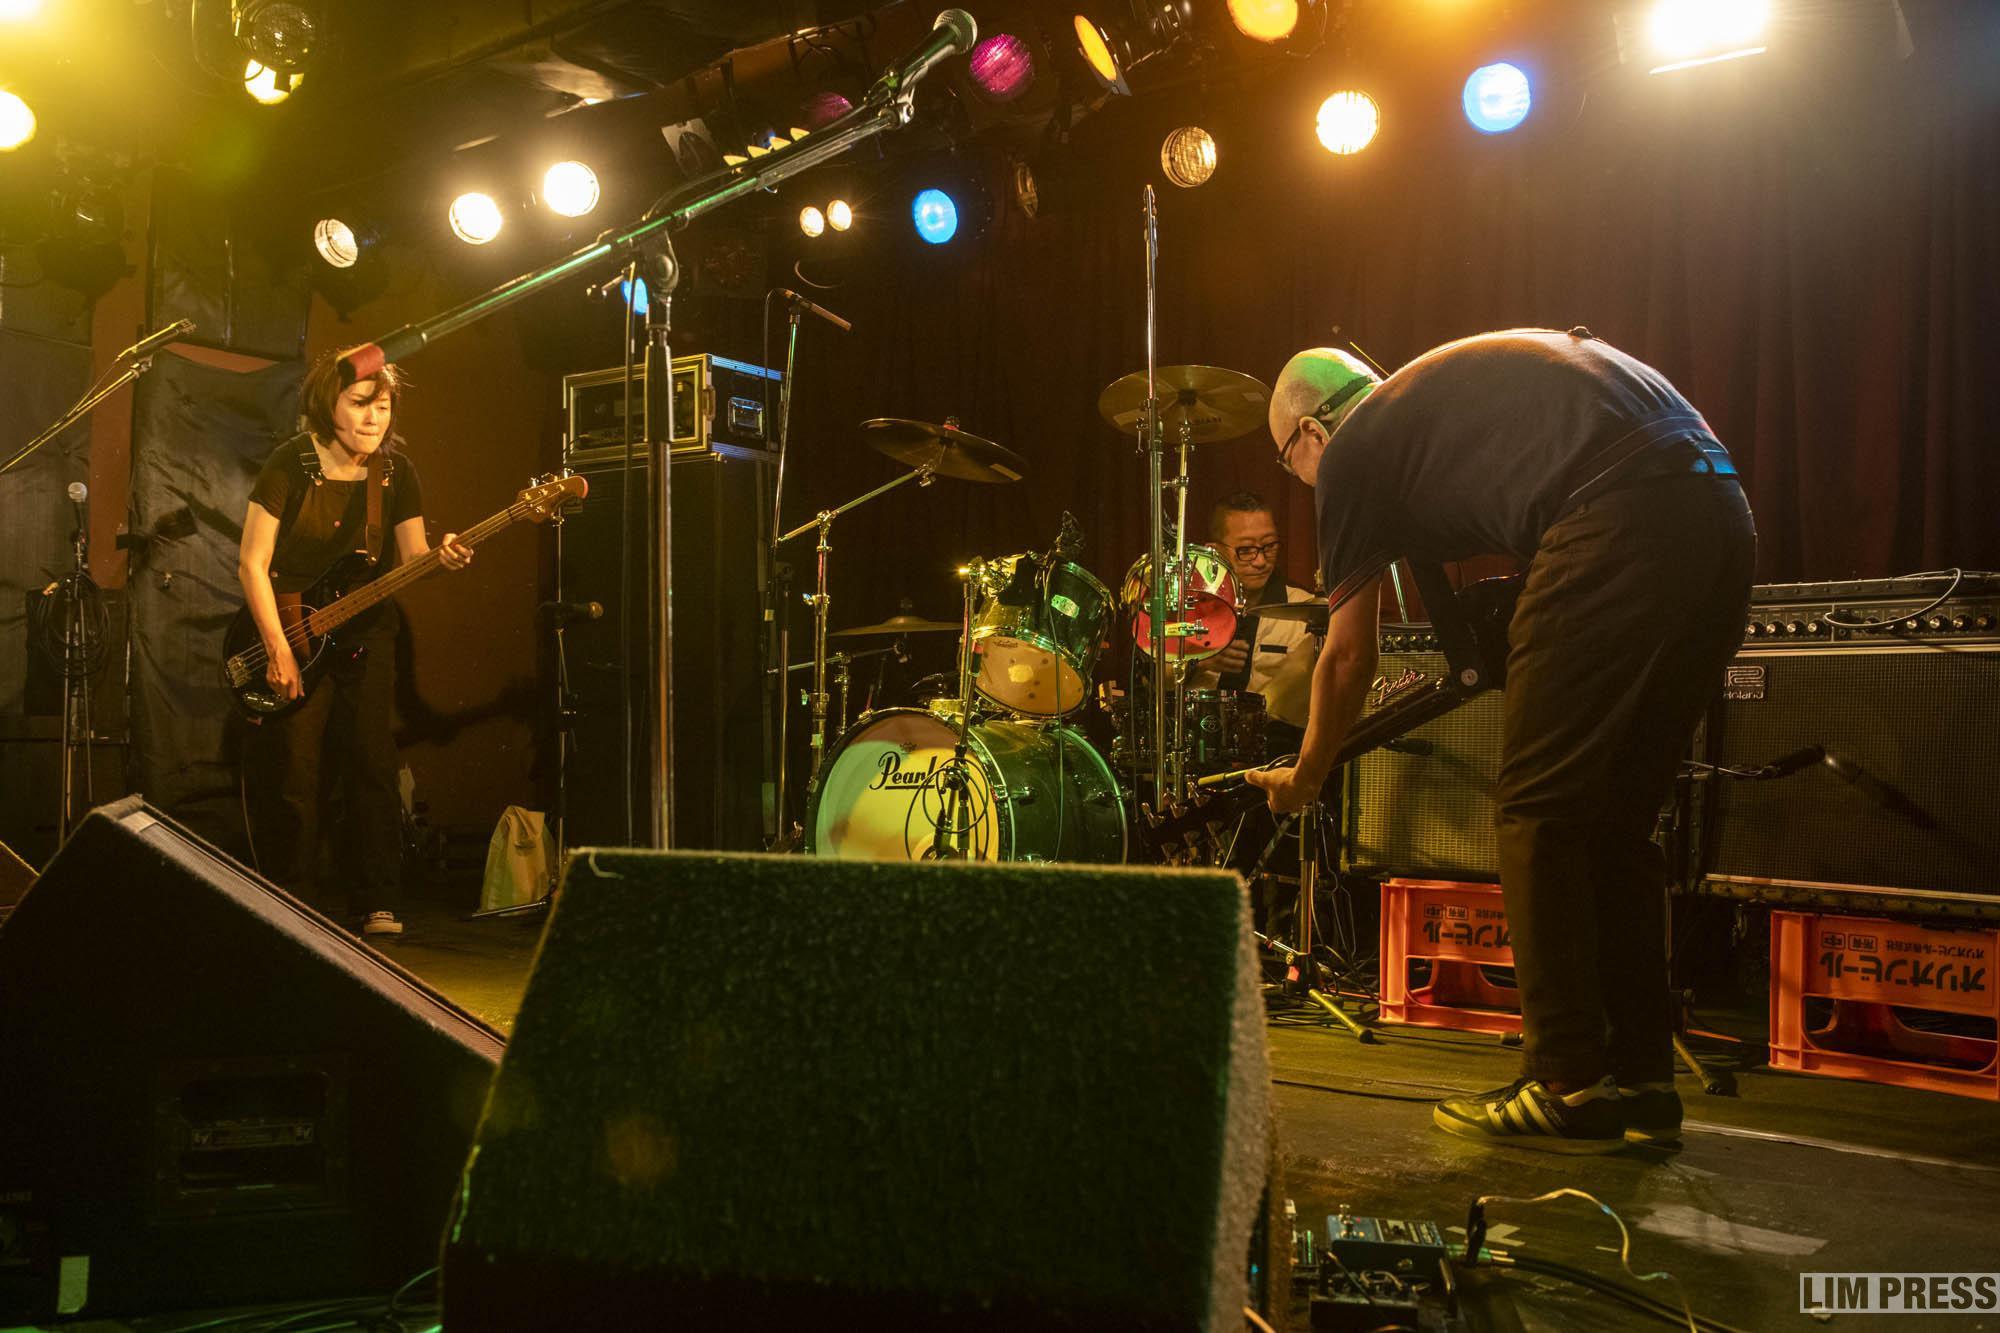 eastern youth  | 沖縄 Music Lane Festival | 2021.2.20